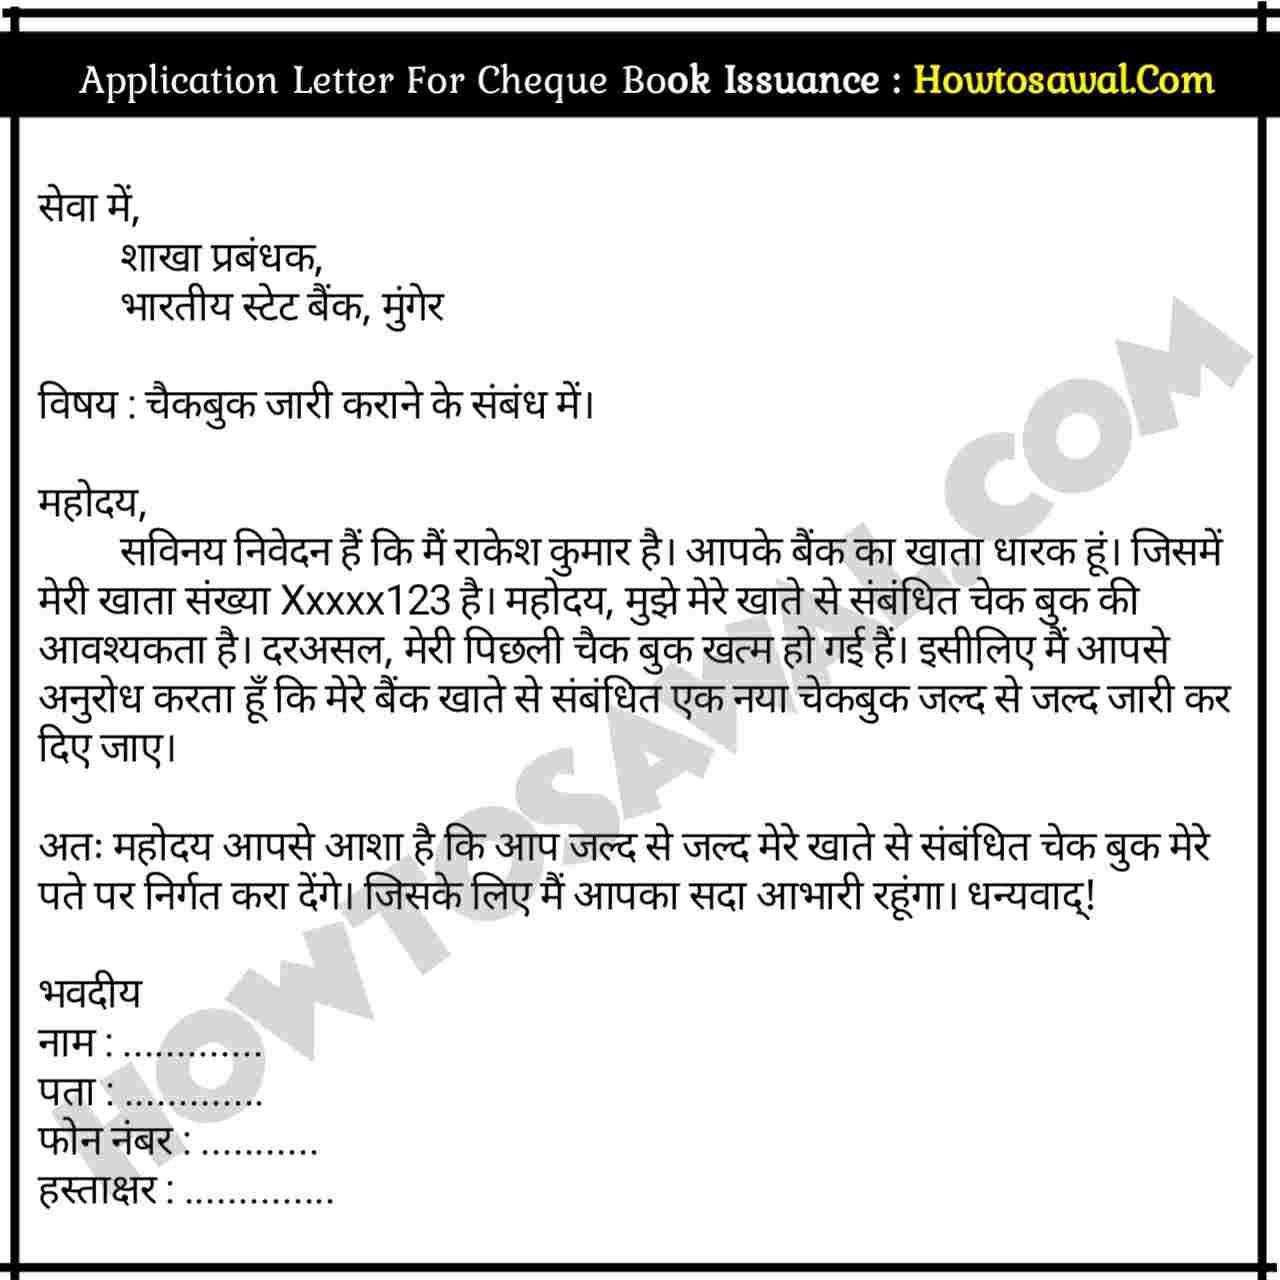 Cheque Book Issue Karane Ke Liye Application In Hindi | Bank Application In Hindi